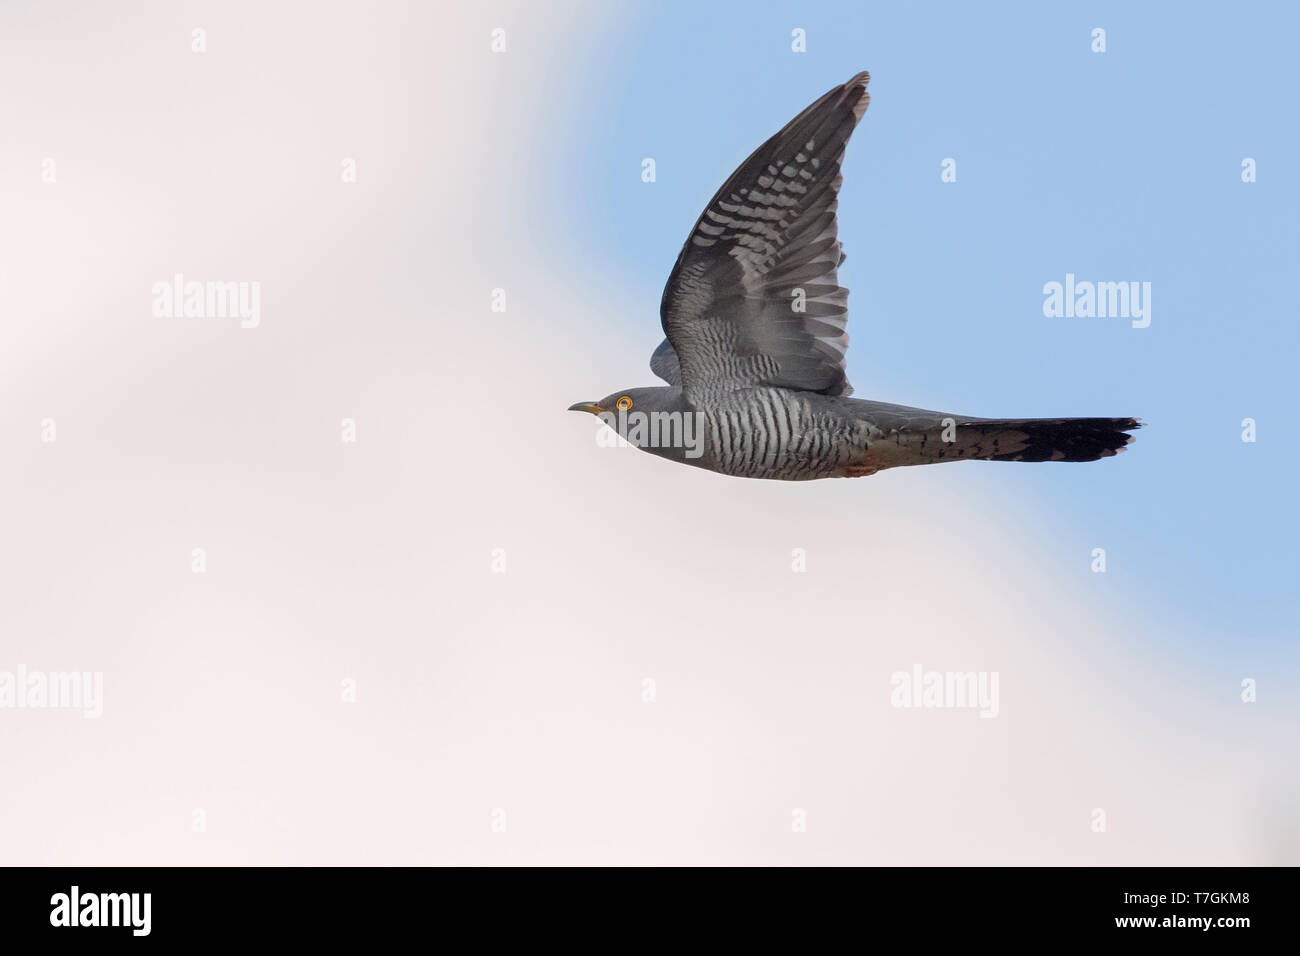 Common cuckoo (Cuculus canorus), adult in flight, Oulu, Northern Ostrobothnia, Finland - Stock Image